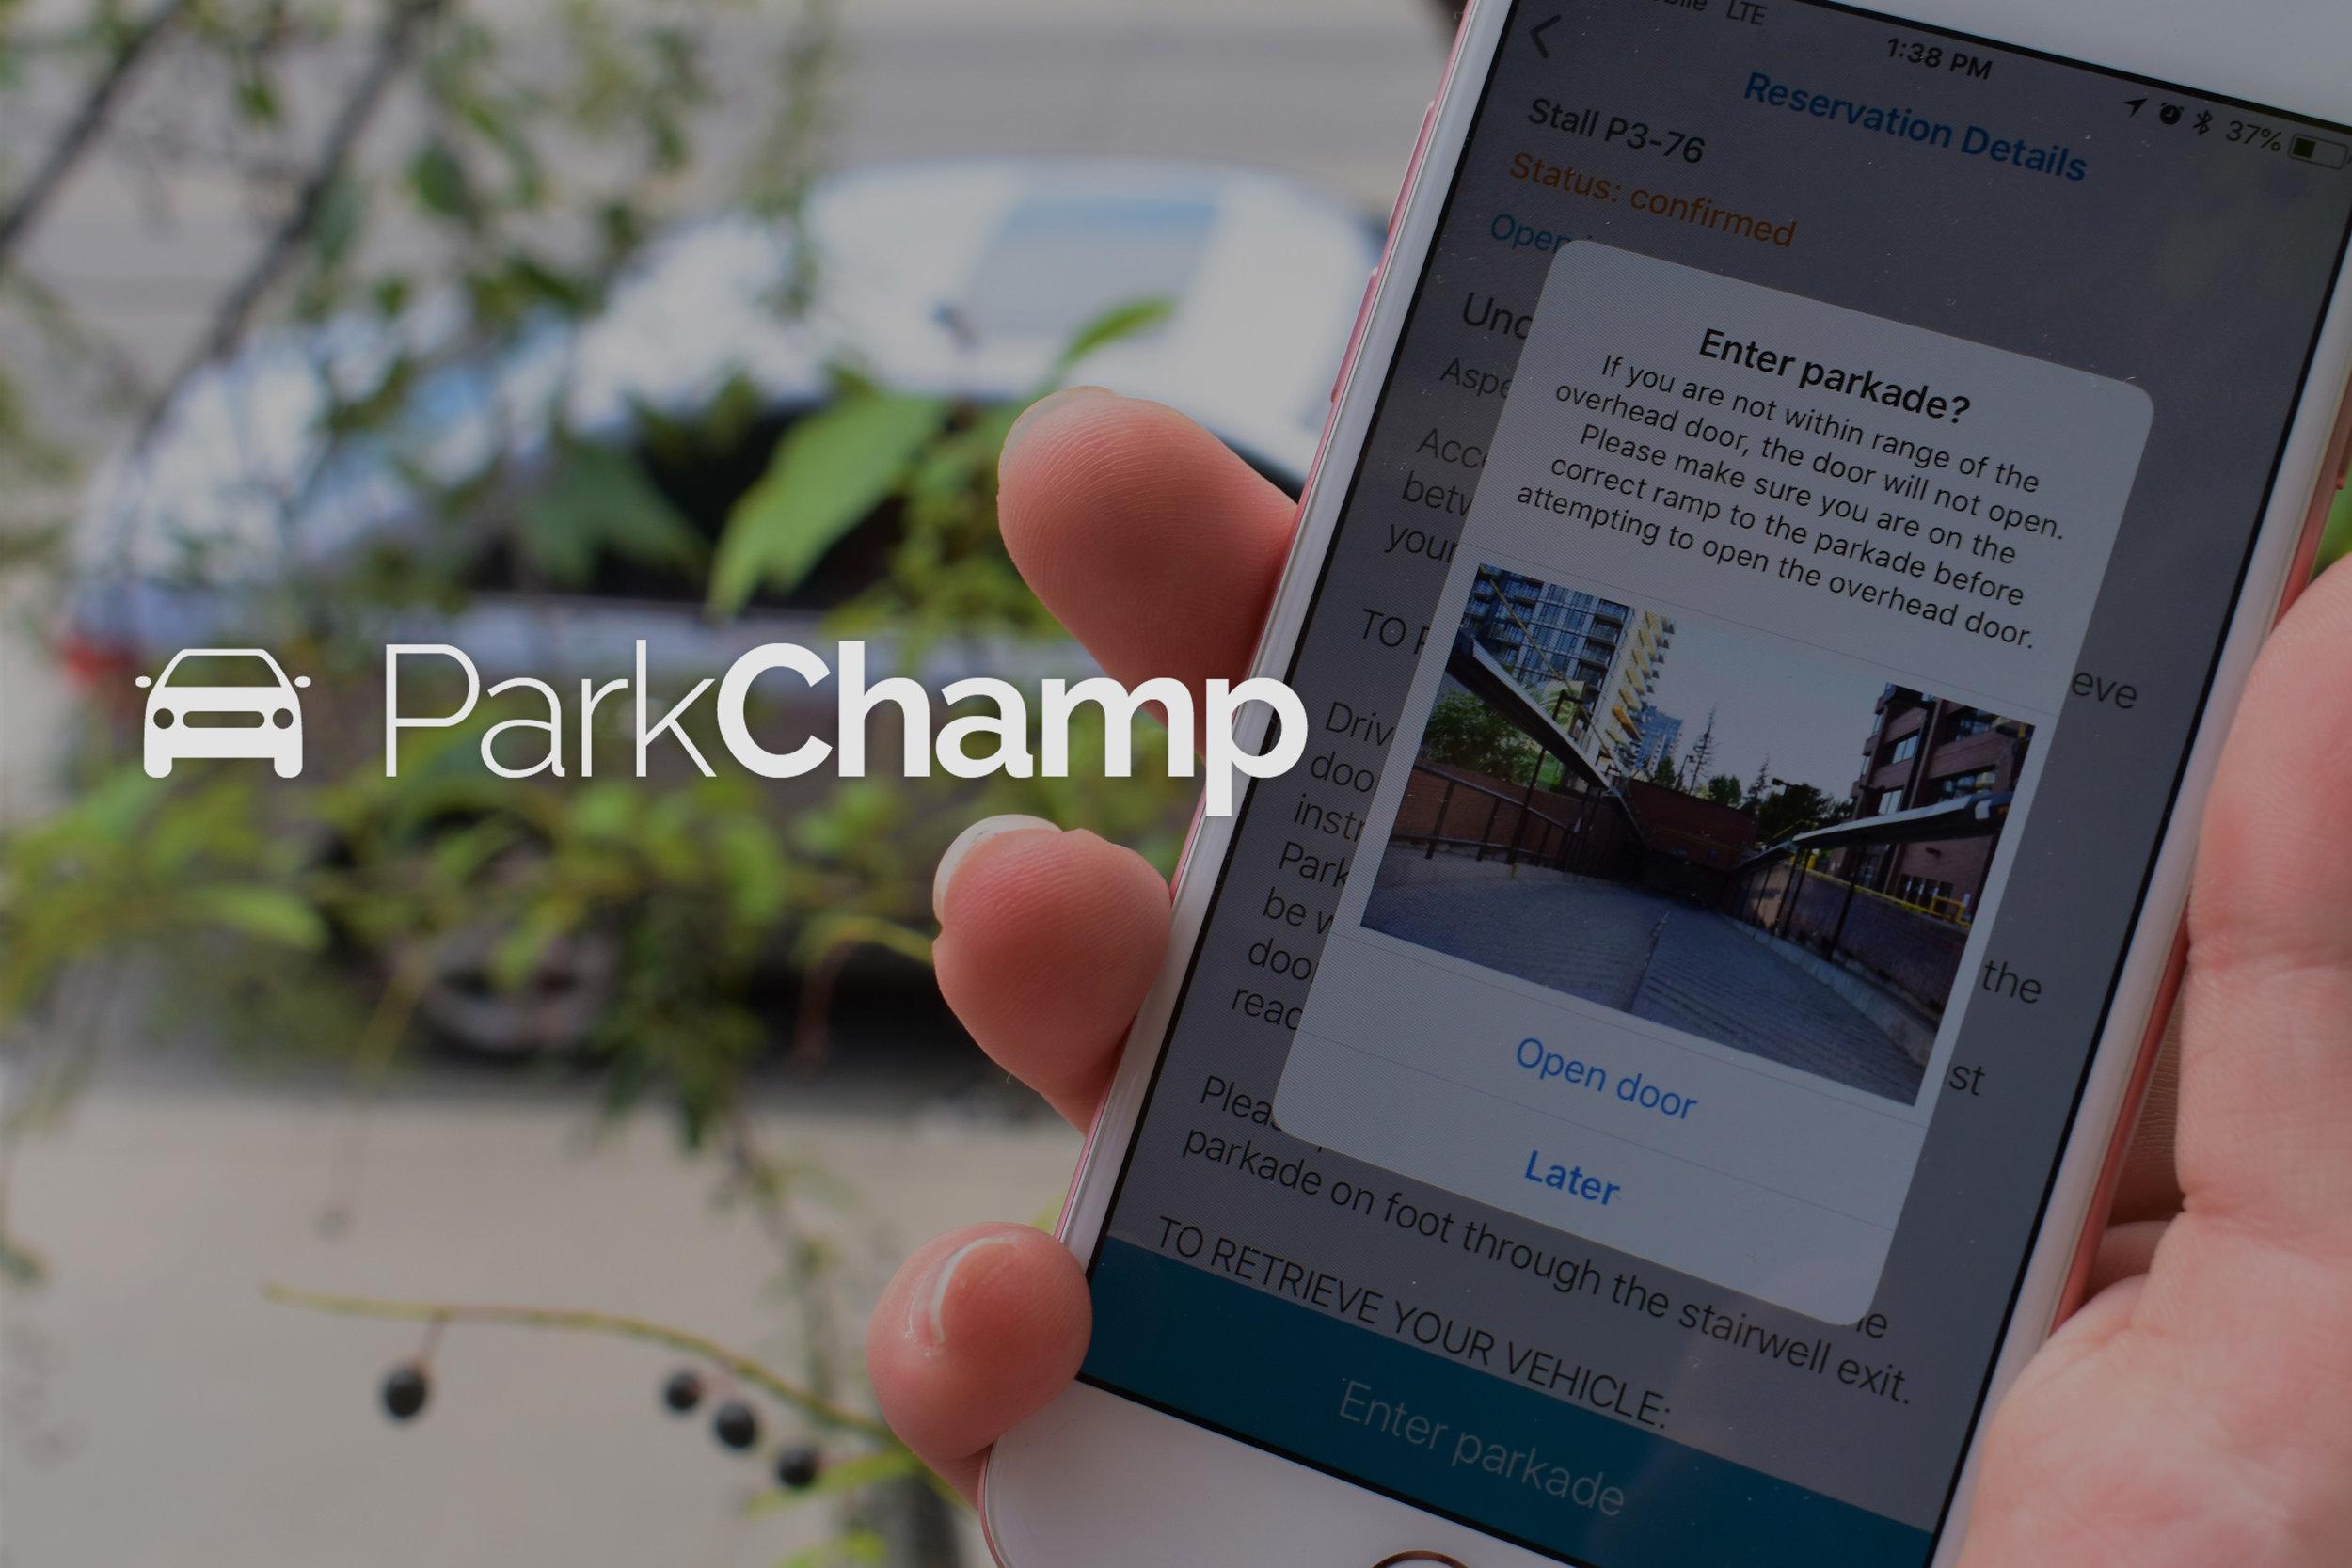 ParkChamp